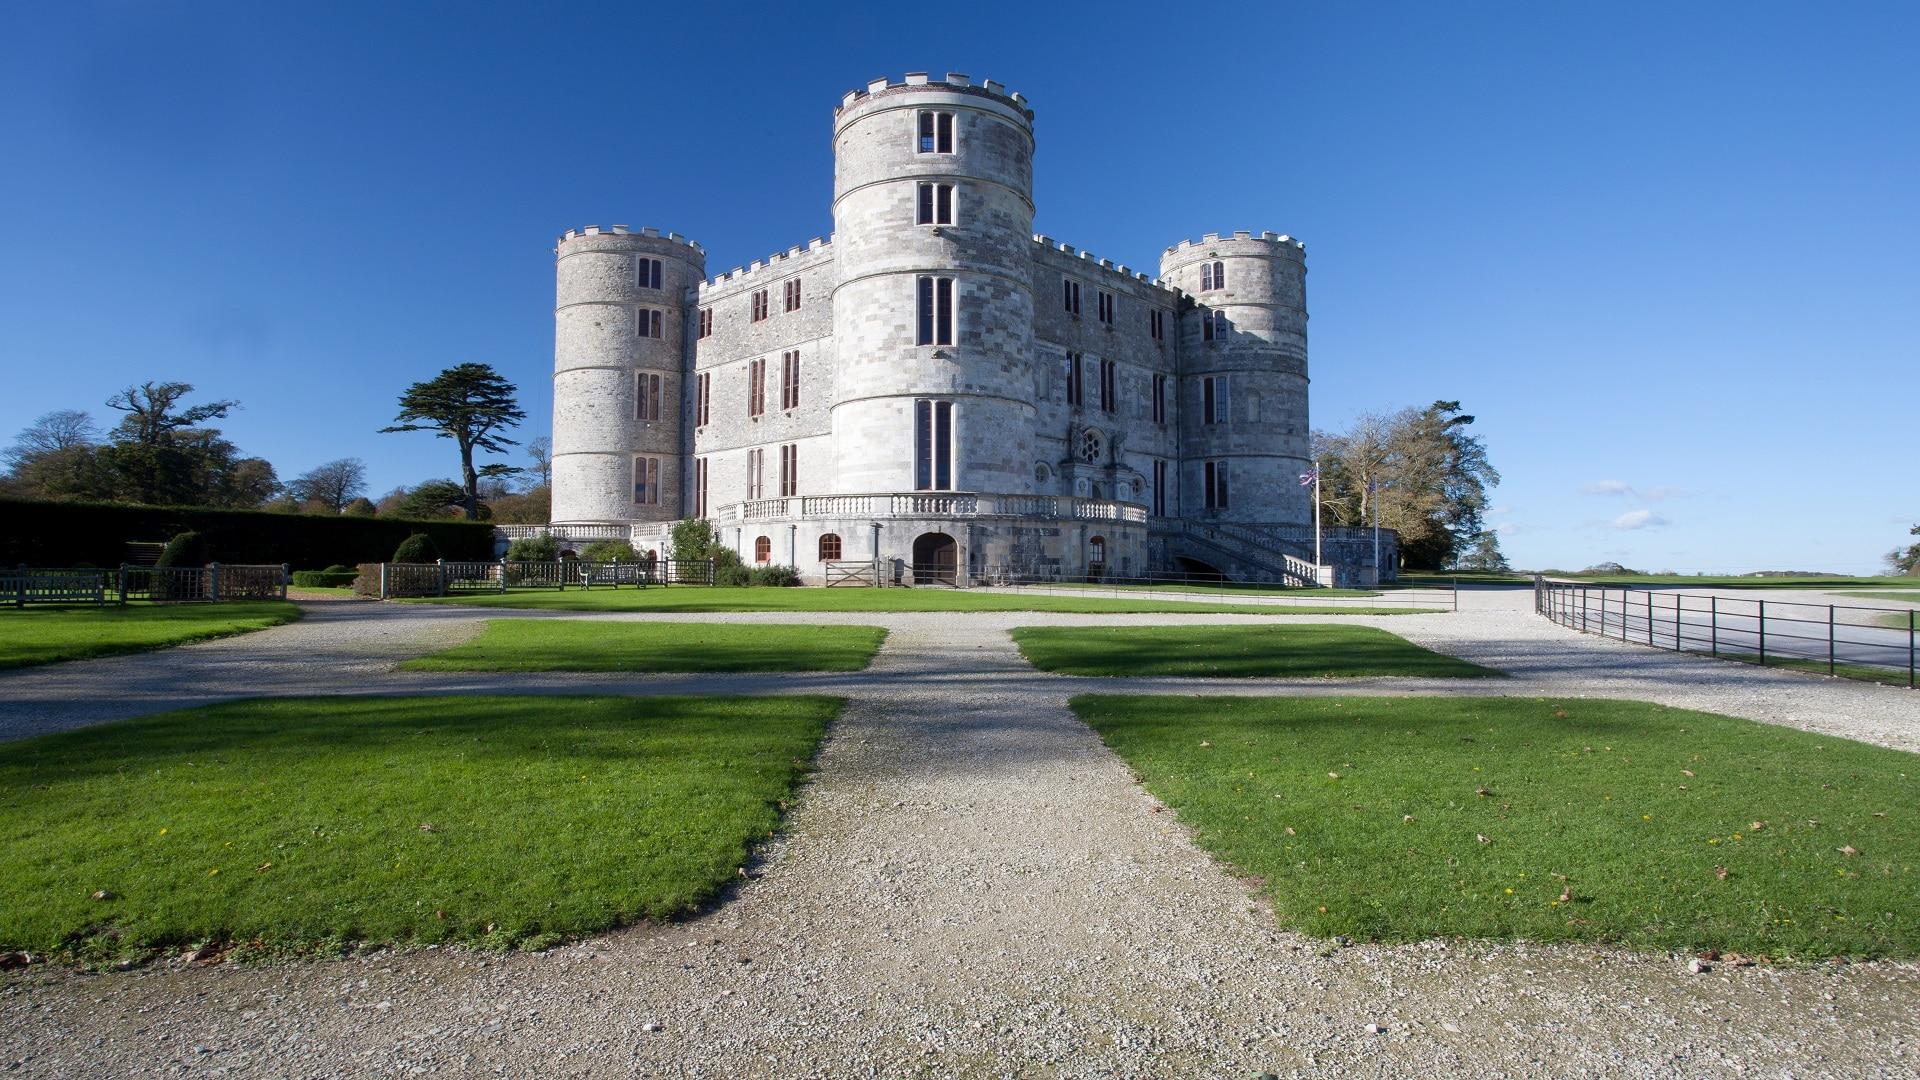 visit lulworth castle